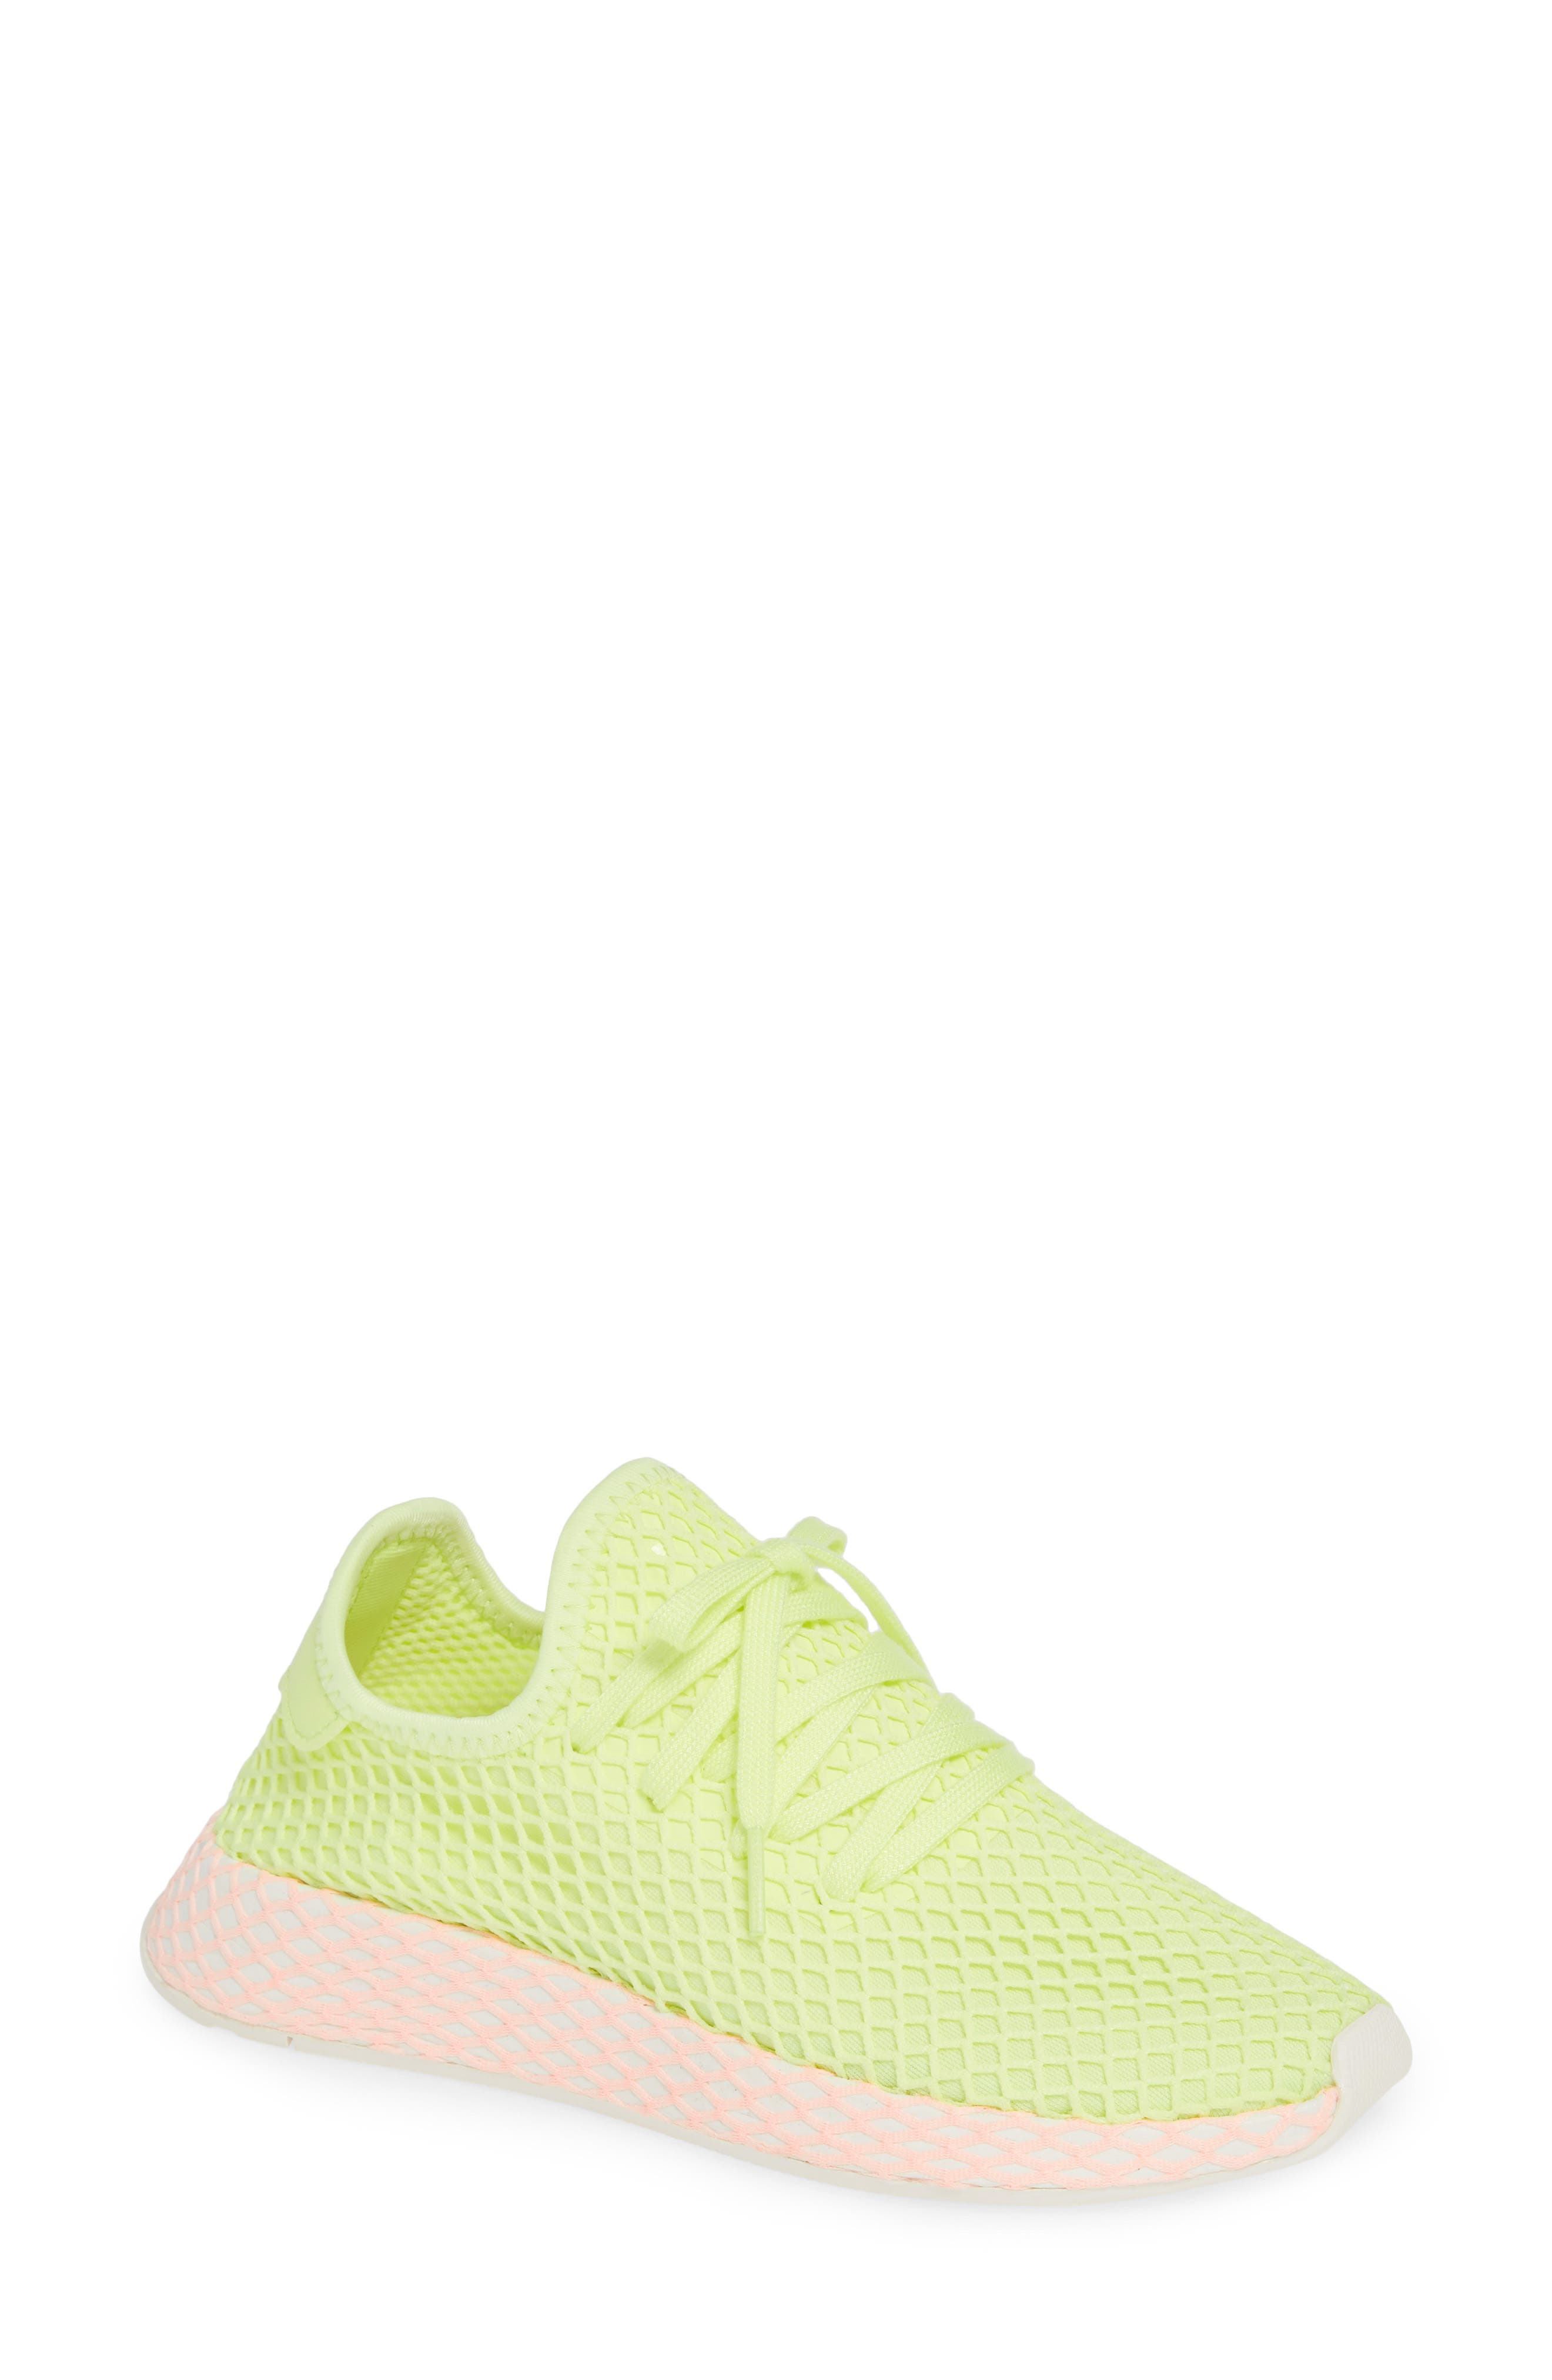 Deerupt Runner Sneaker,                             Main thumbnail 1, color,                             GLOW/ GLOW/ CLEAR LILAC